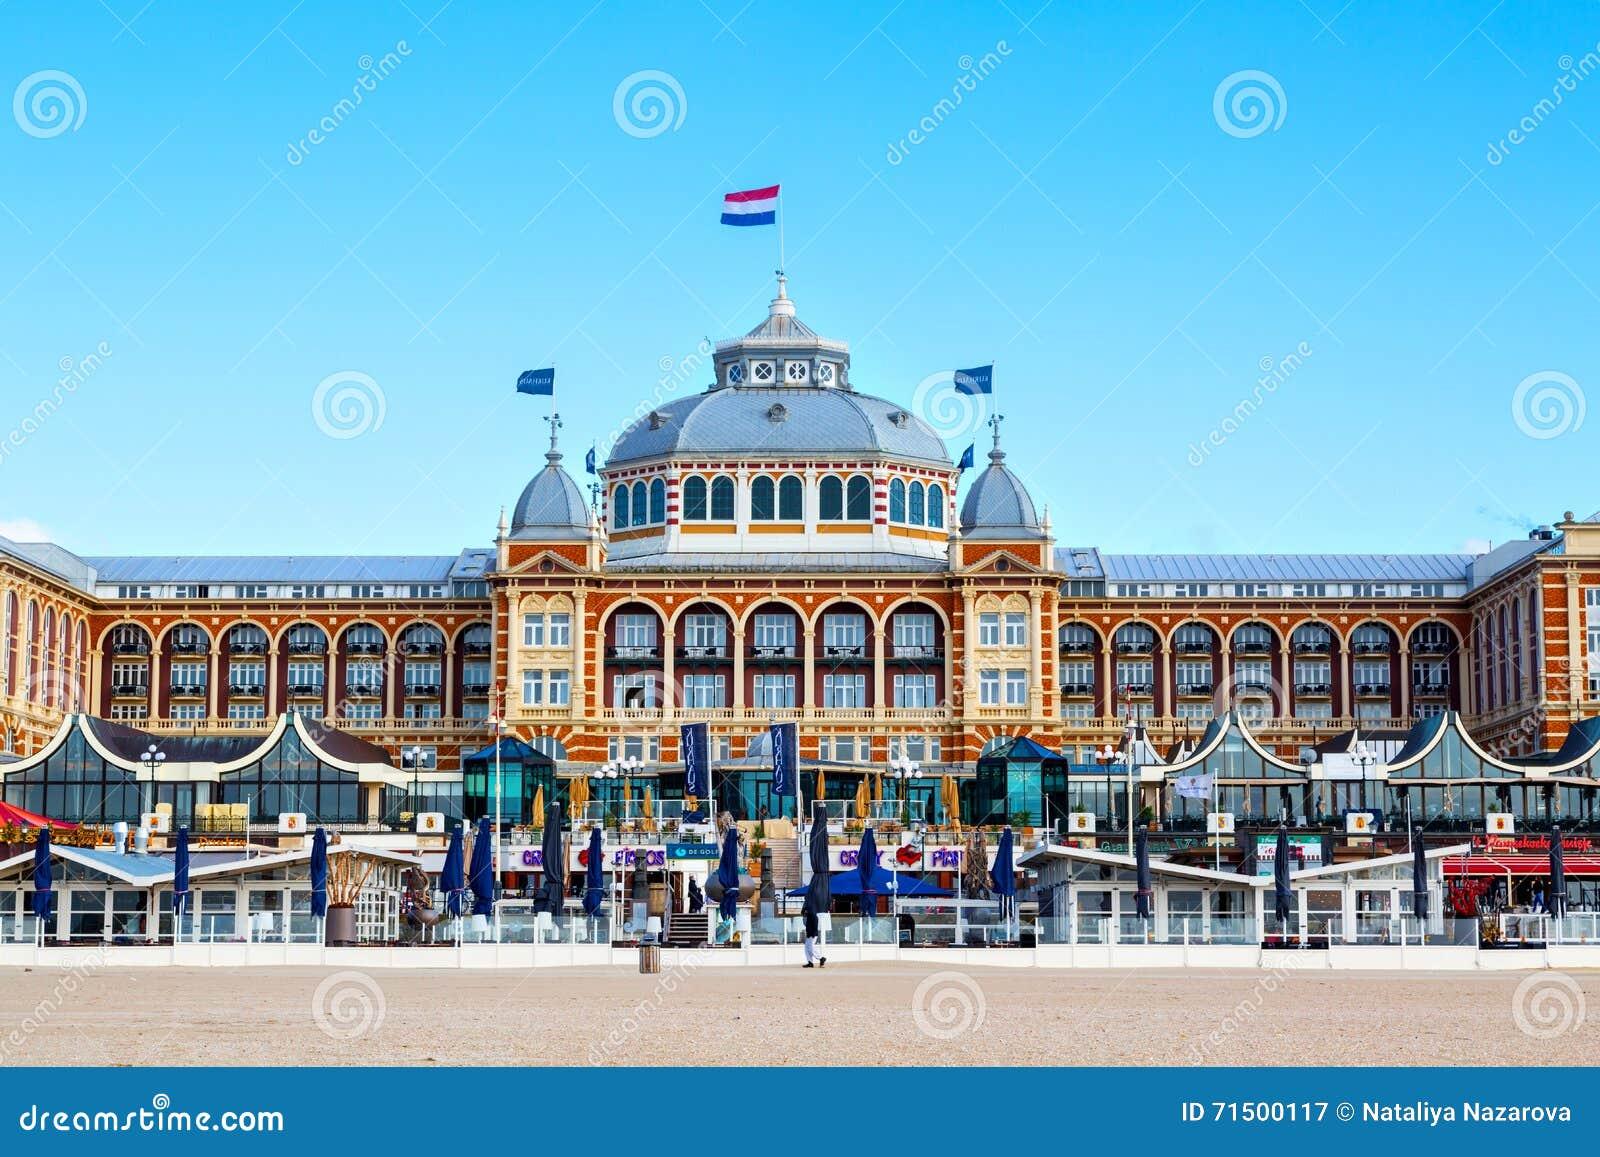 Hotel La Ville Den Haag